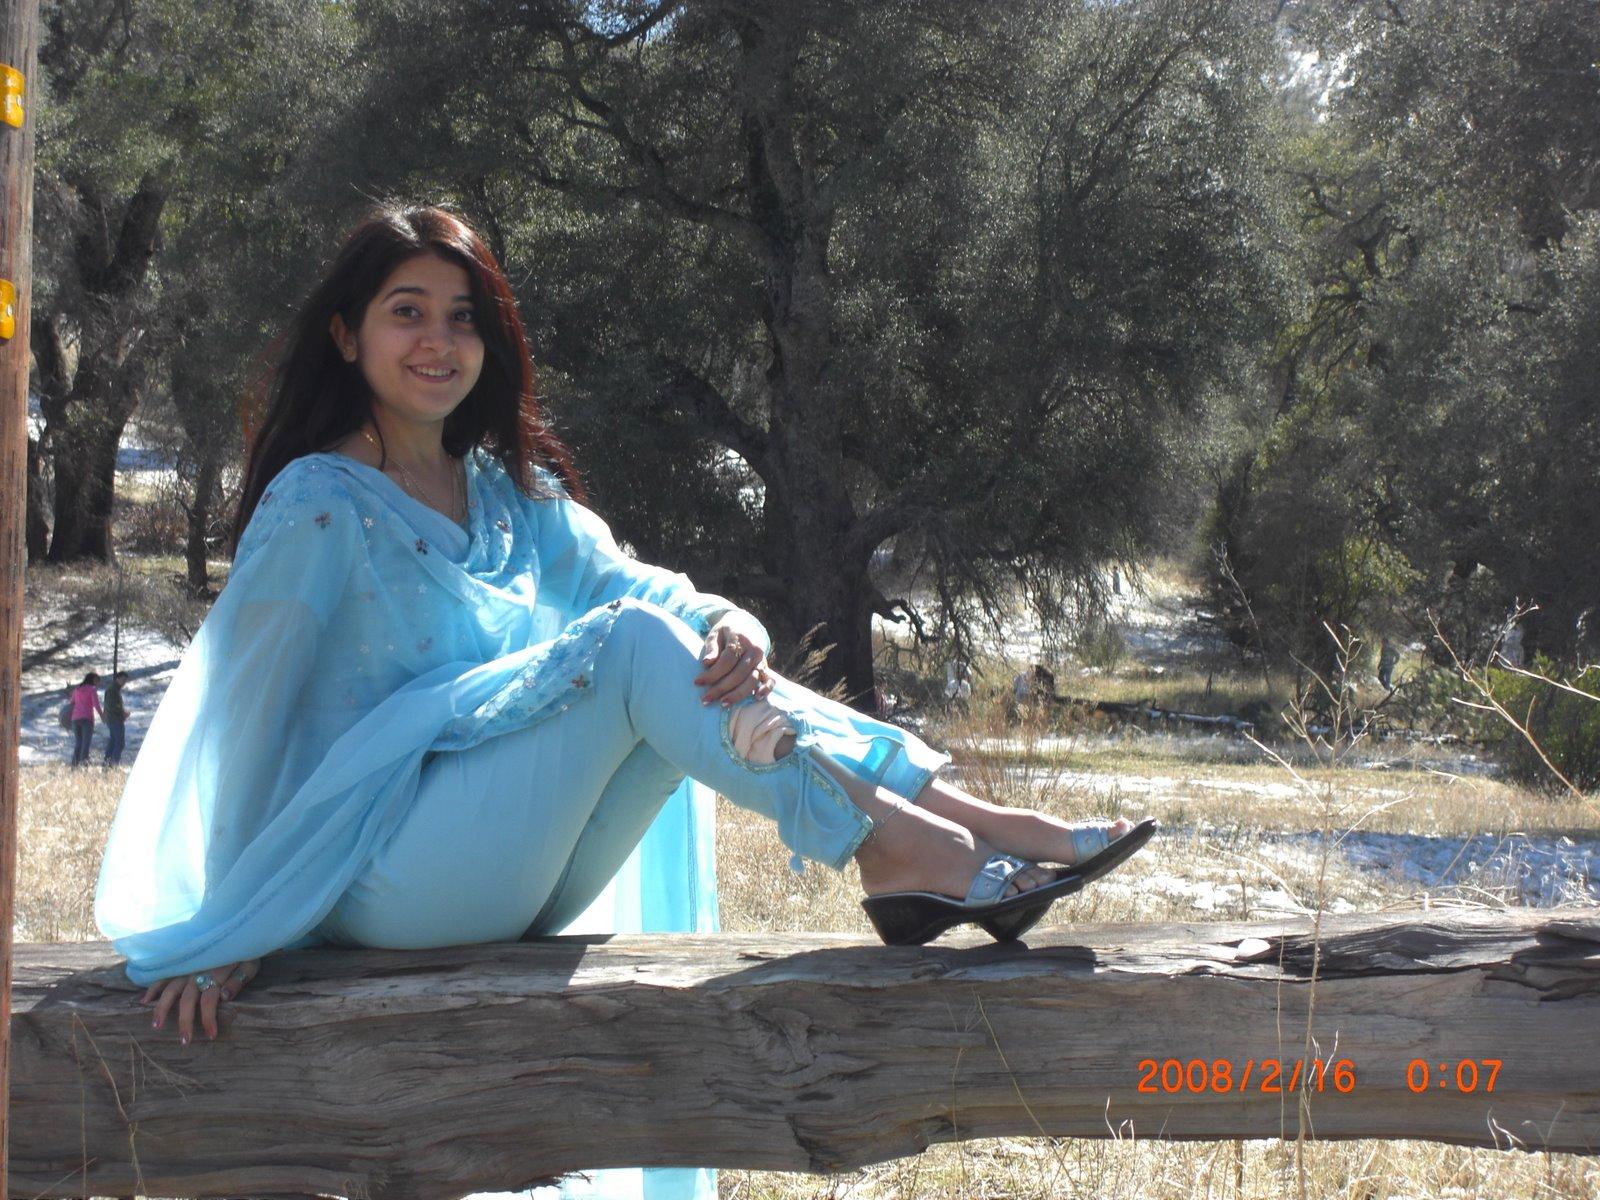 http://3.bp.blogspot.com/-ws2SKhXSV-I/TgOn2TUxAYI/AAAAAAAAAdY/U2DqmoCMZwU/s1600/Pakistani+Girls+Wallpapers-1.jpg